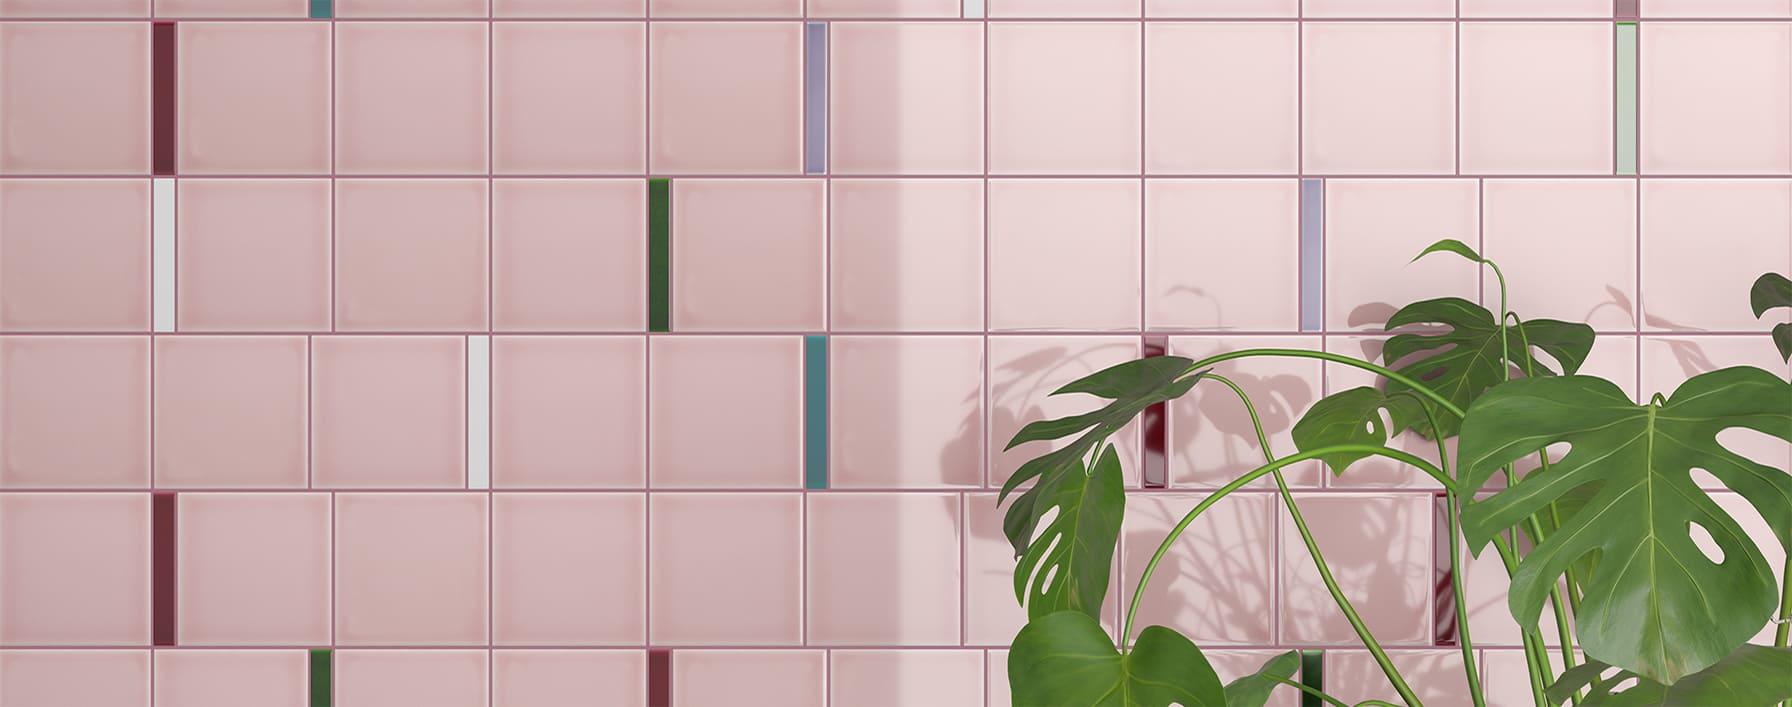 Azulejo 15x15 y 2,5x15